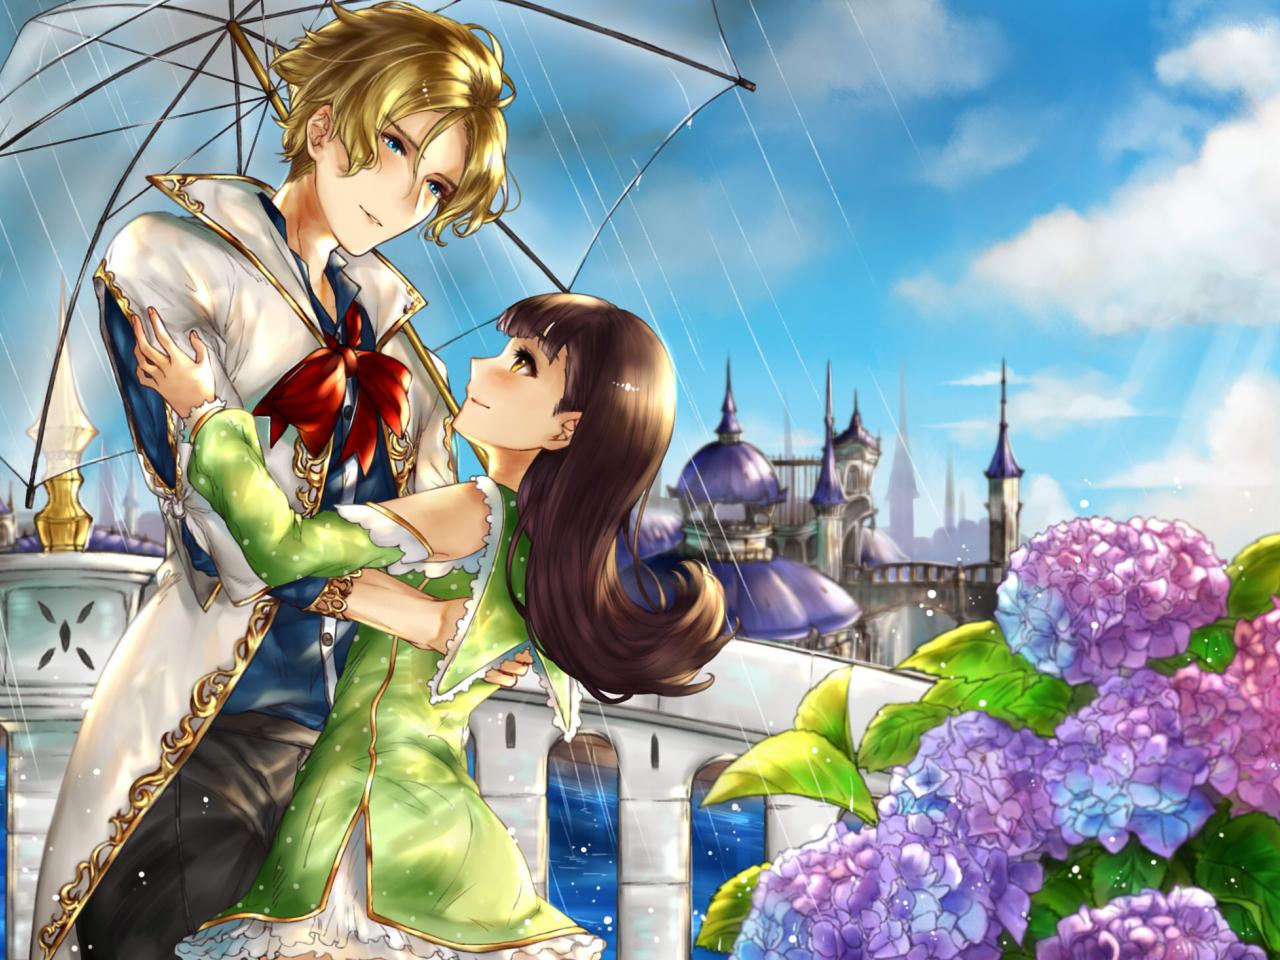 Desktop Wallpaper Cute Anime Couple Rain Umbrella Hd Image Picture Background 38ivym